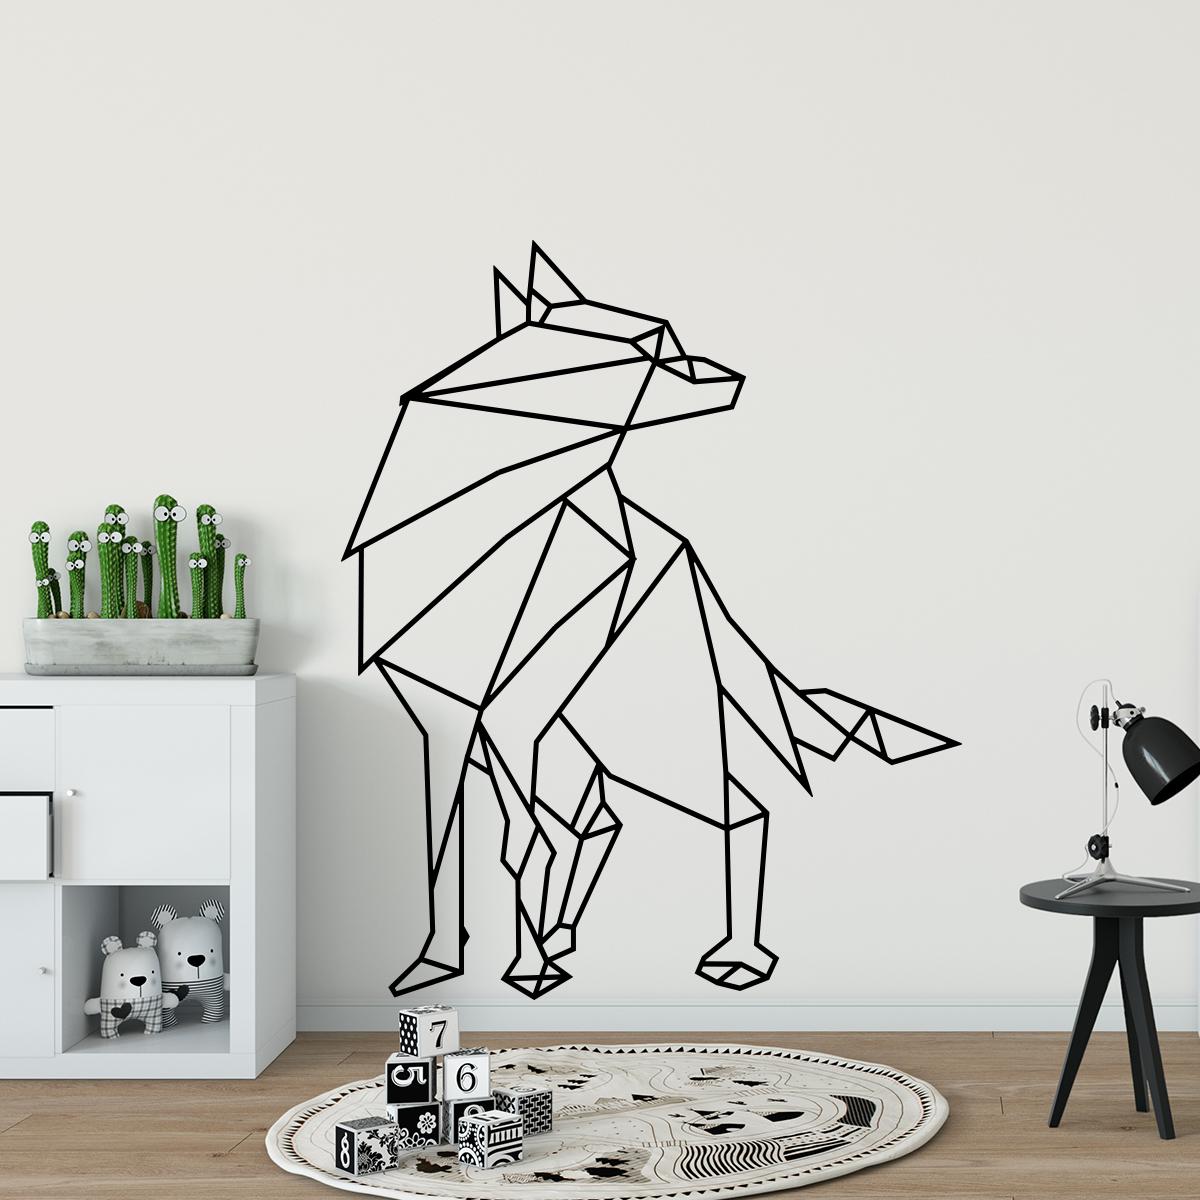 sticker origami loup stickers art et design artistiques ambiance sticker. Black Bedroom Furniture Sets. Home Design Ideas